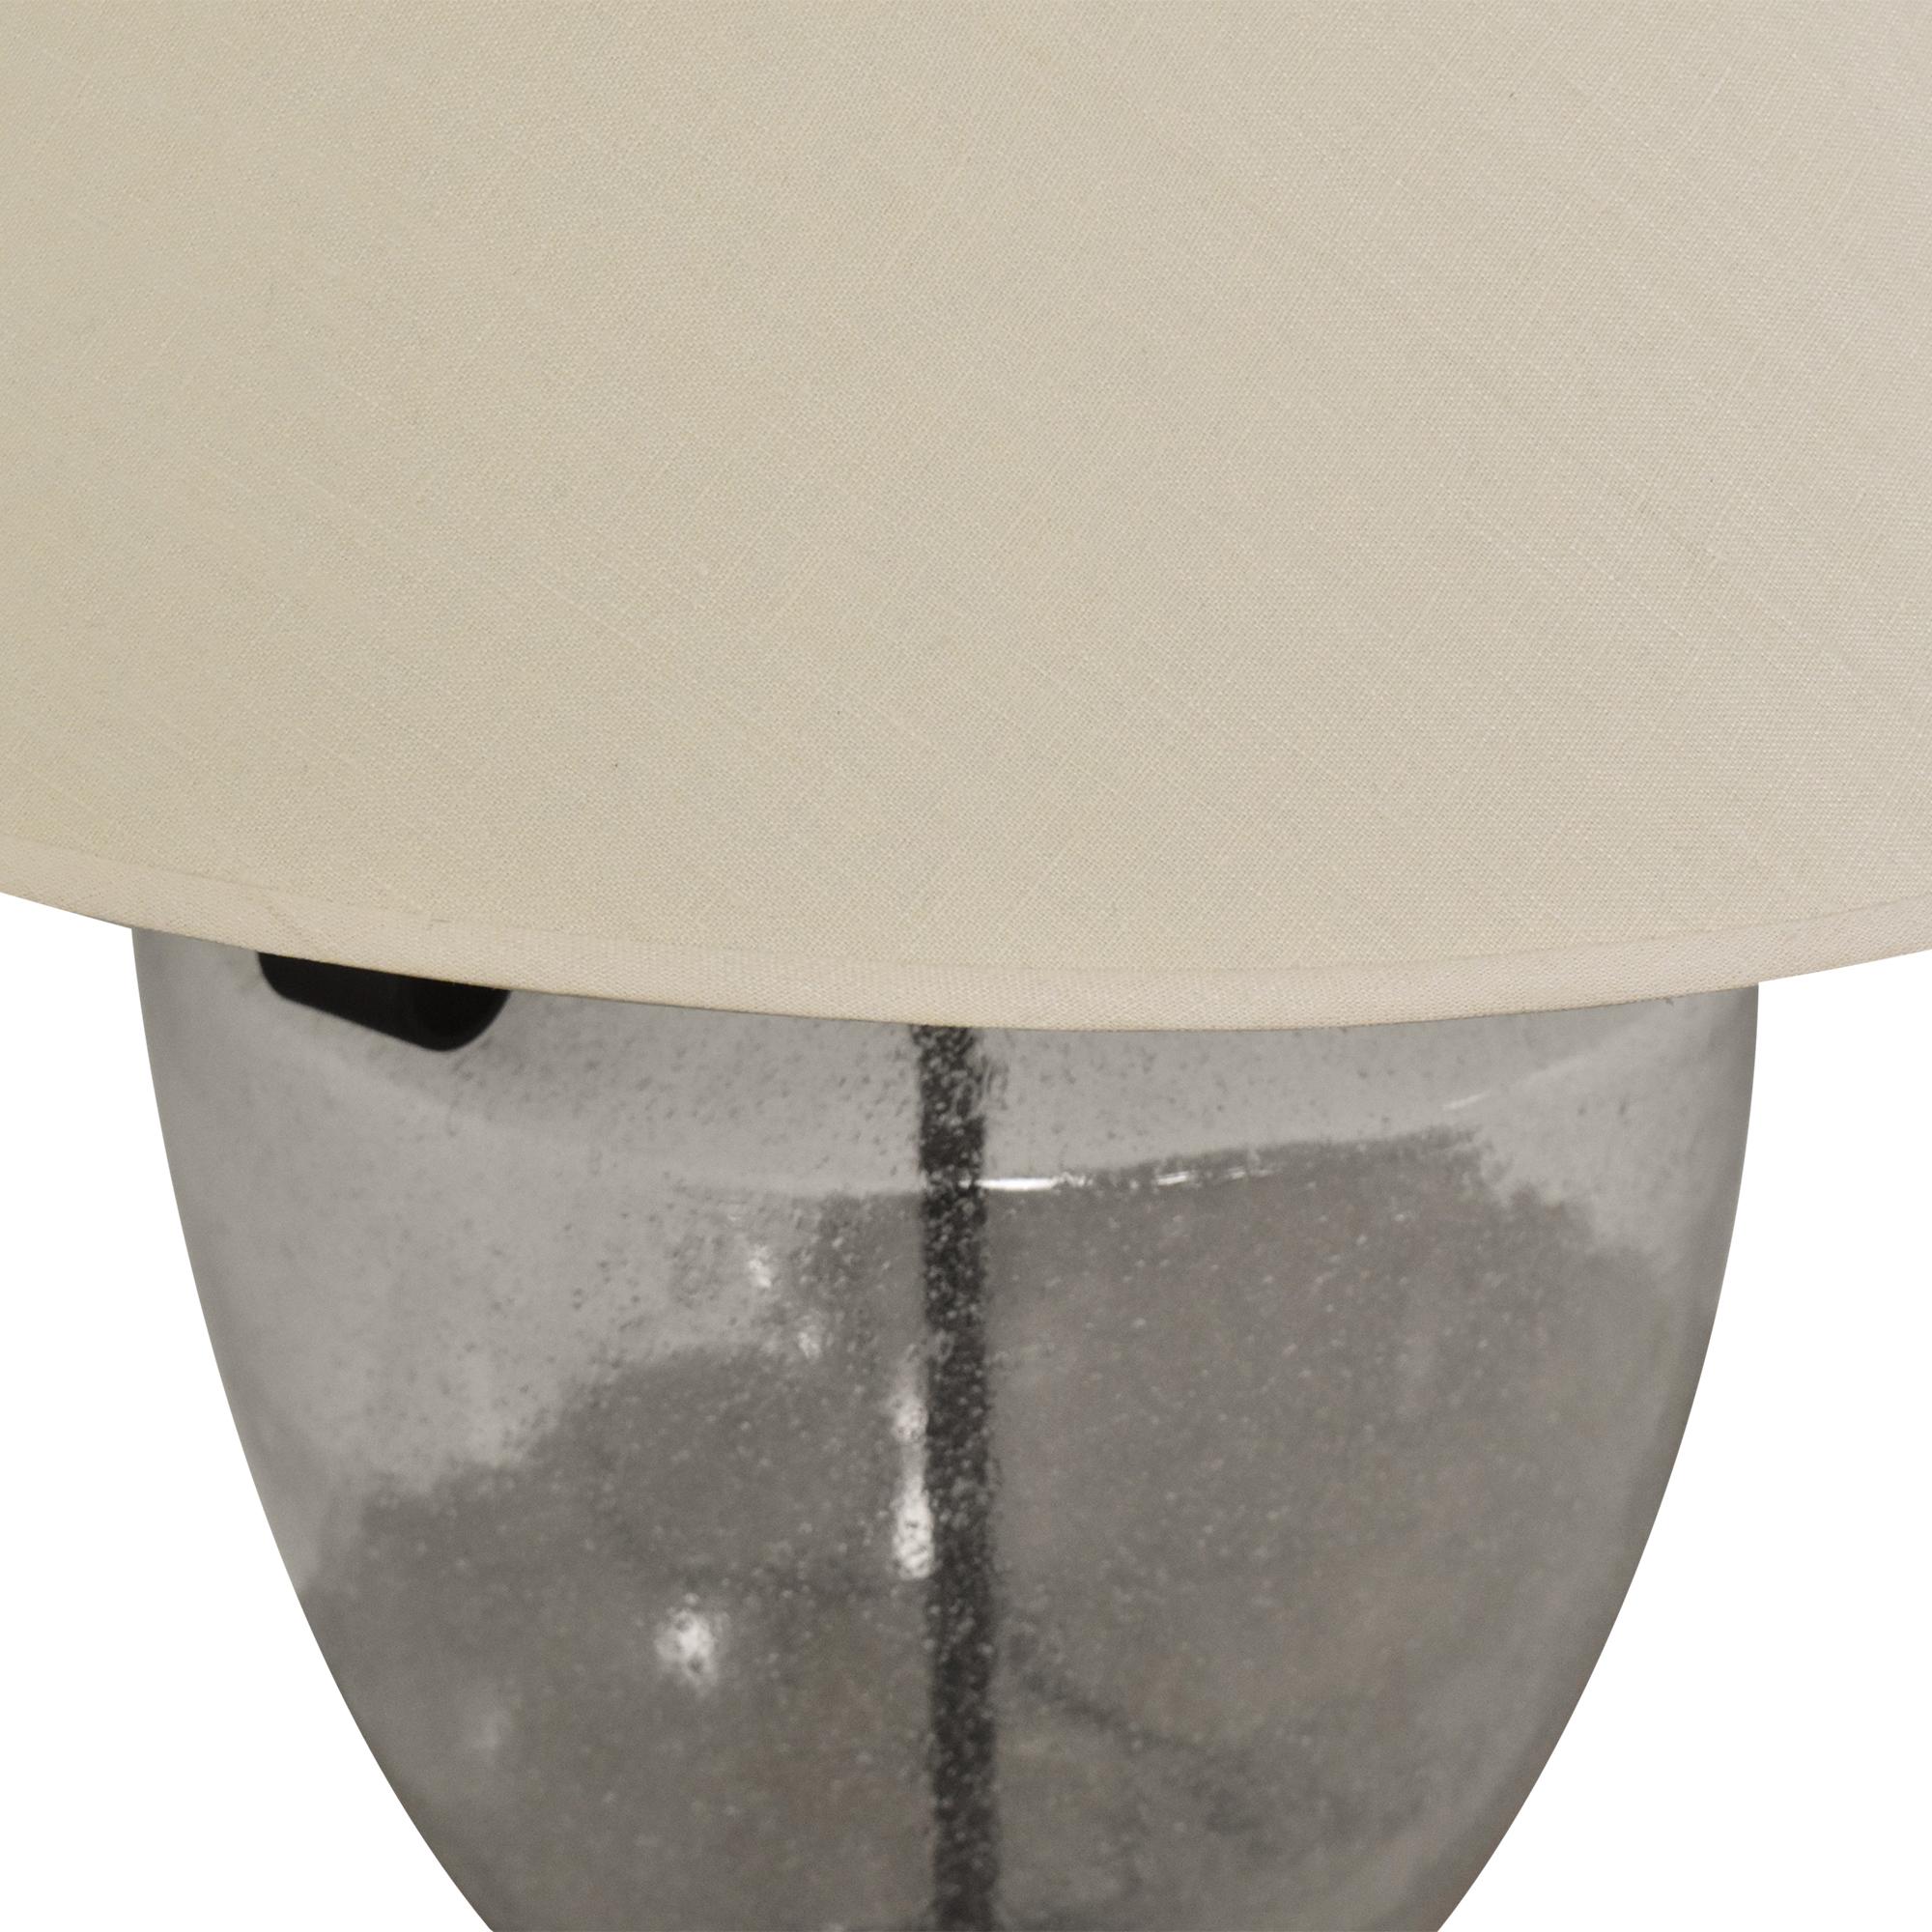 Ethan Allen Ethan Allen Modern Table Lamp used